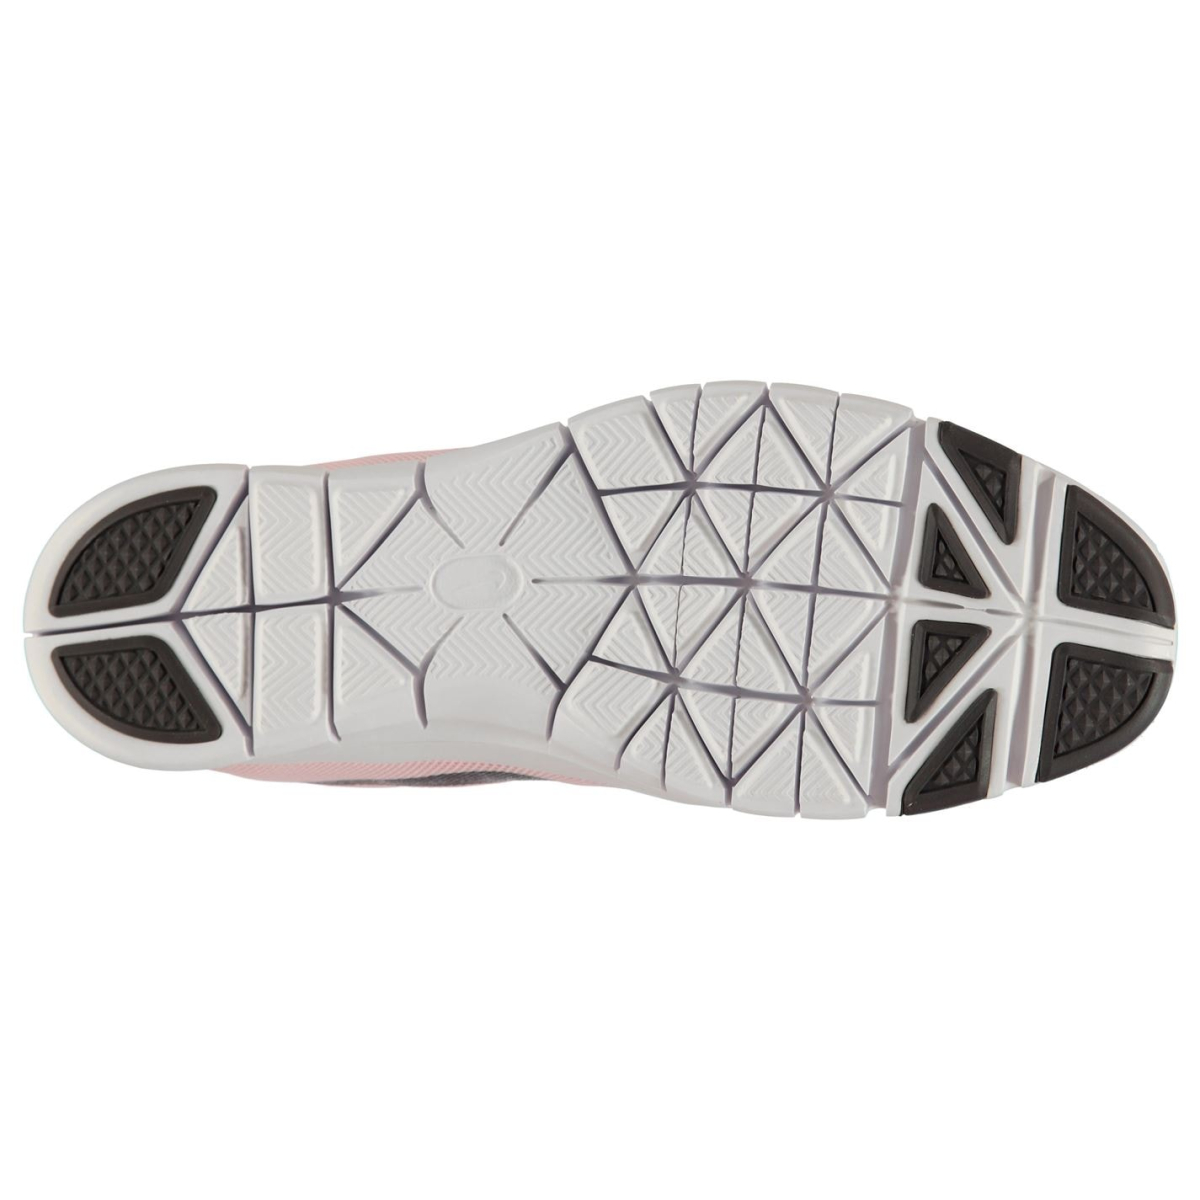 Nike-Flex-Laufschuhe-Turnschuhe-Damen-Sneaker-Sportschuhe-Jogging-3088 Indexbild 15